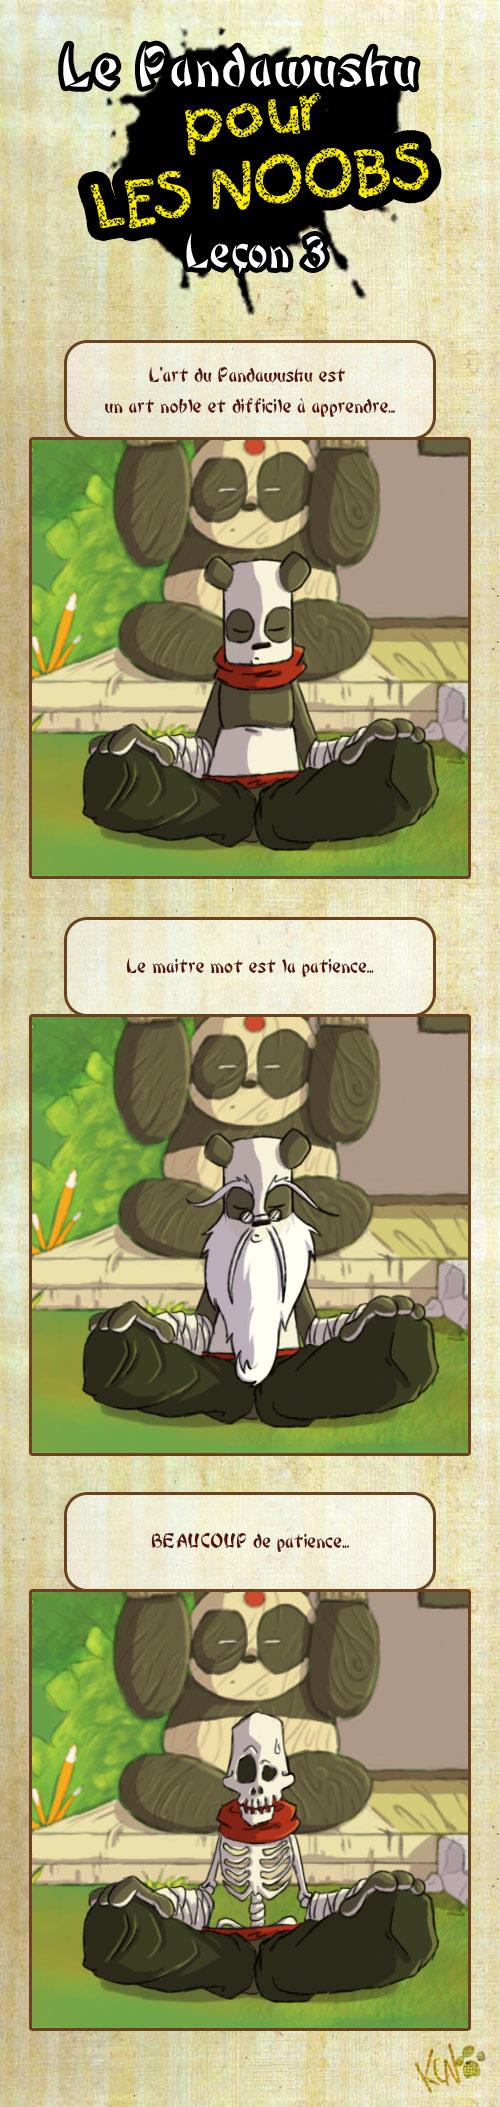 Le Pandawushu pour les Noobs Pandawushu03